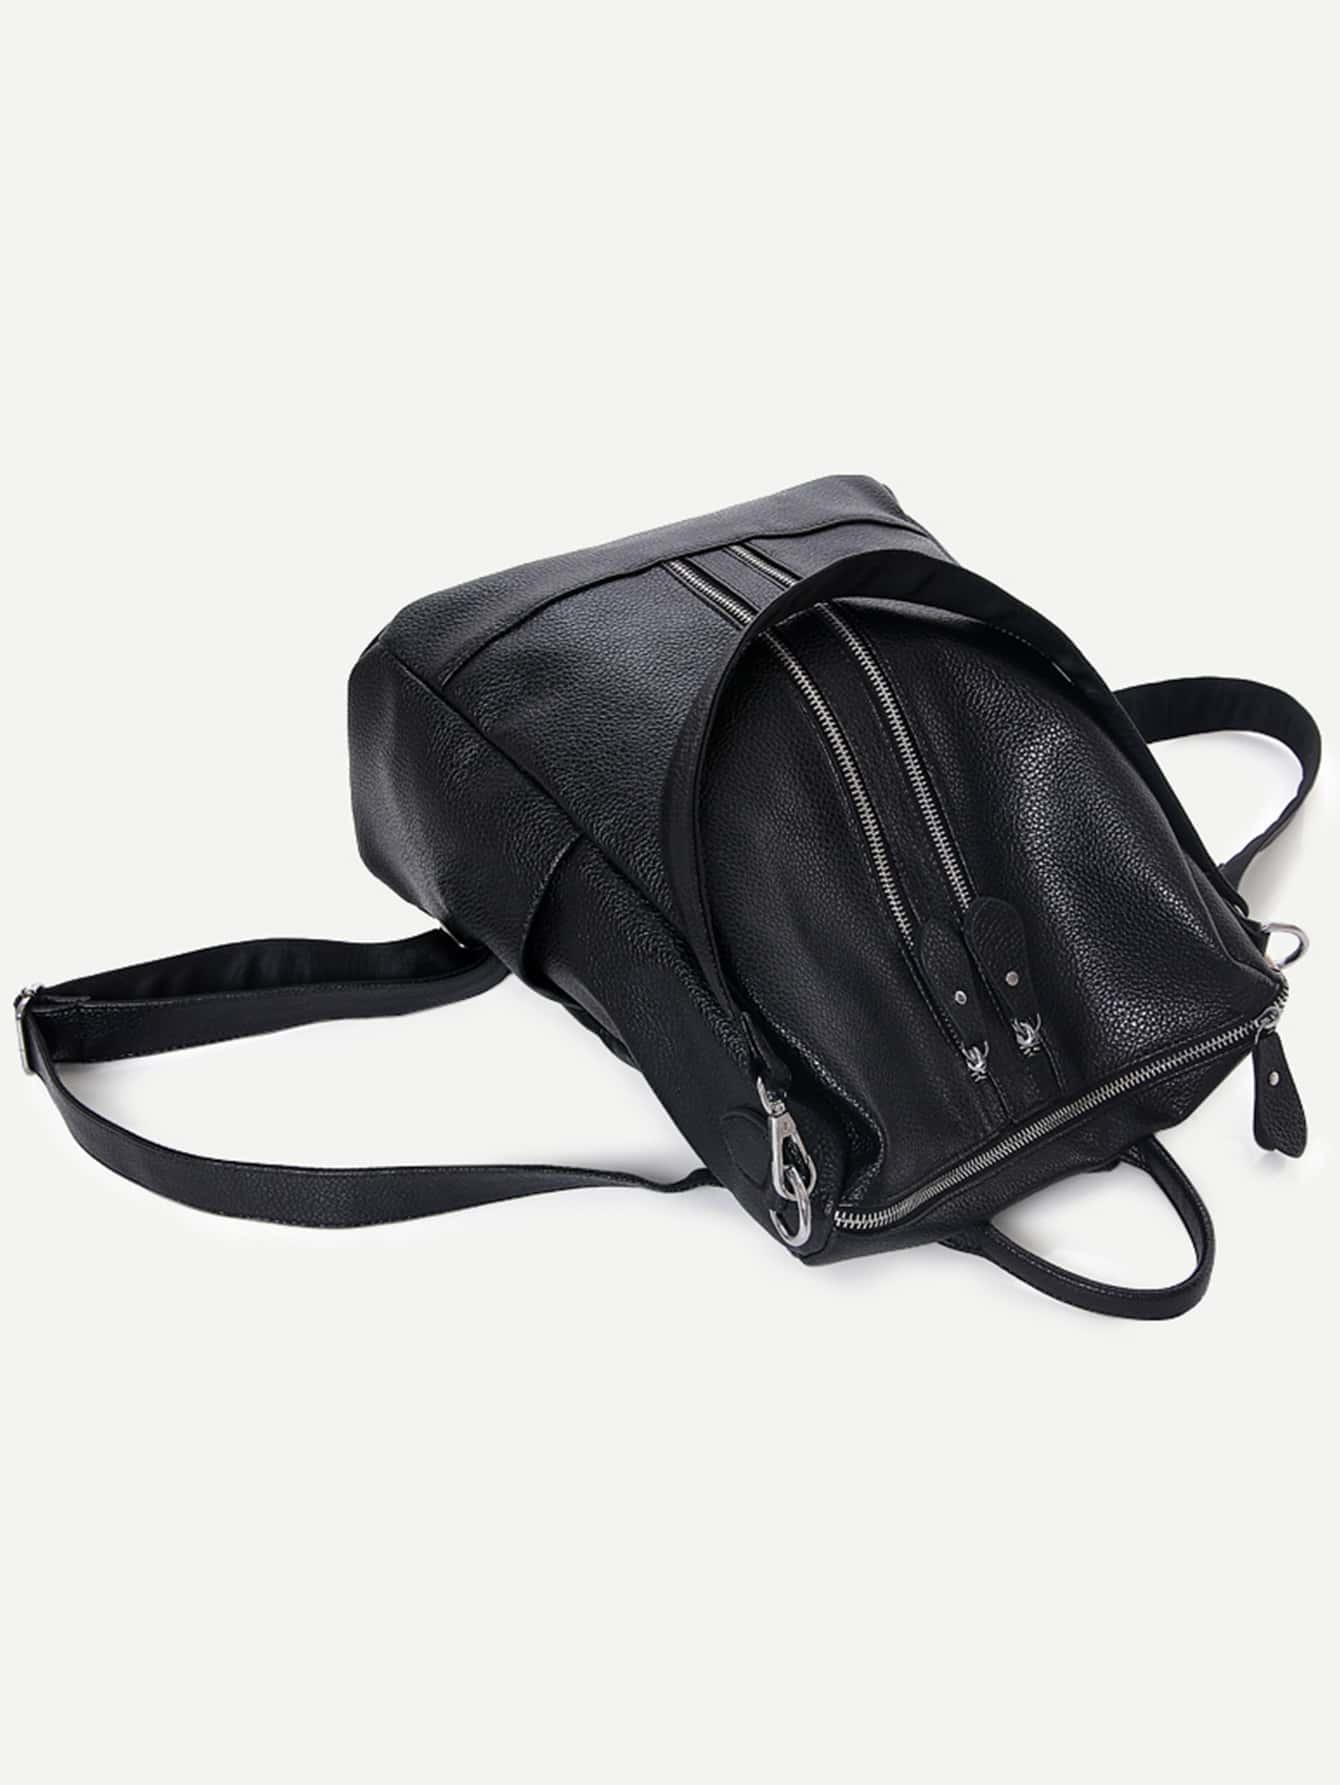 bag160819311_2